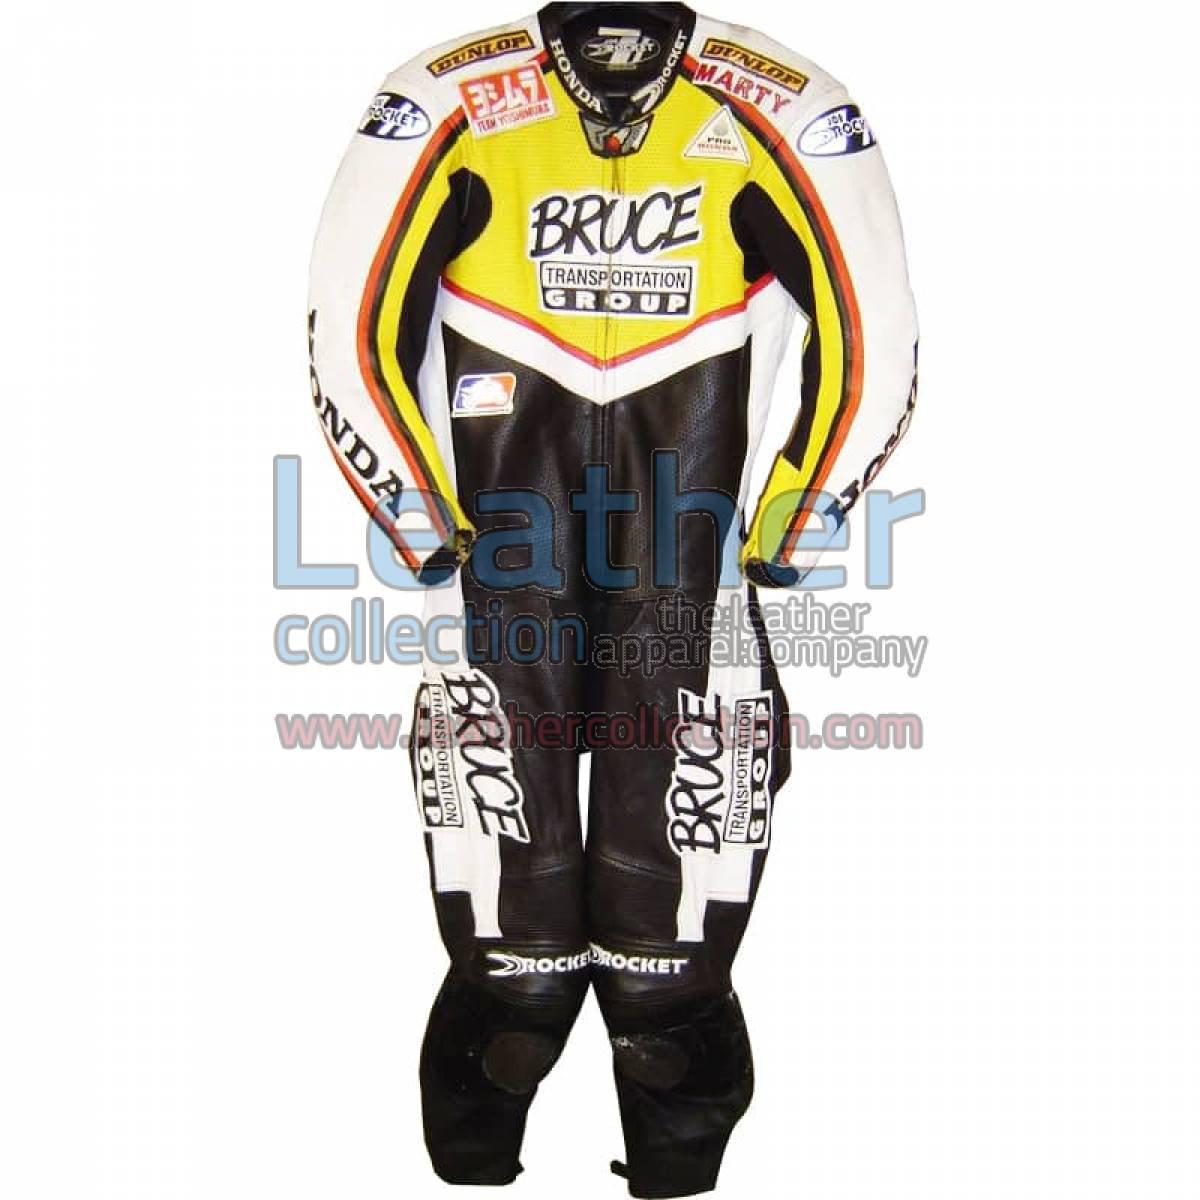 Marty Craggill Honda AMA 2003 Race Suit